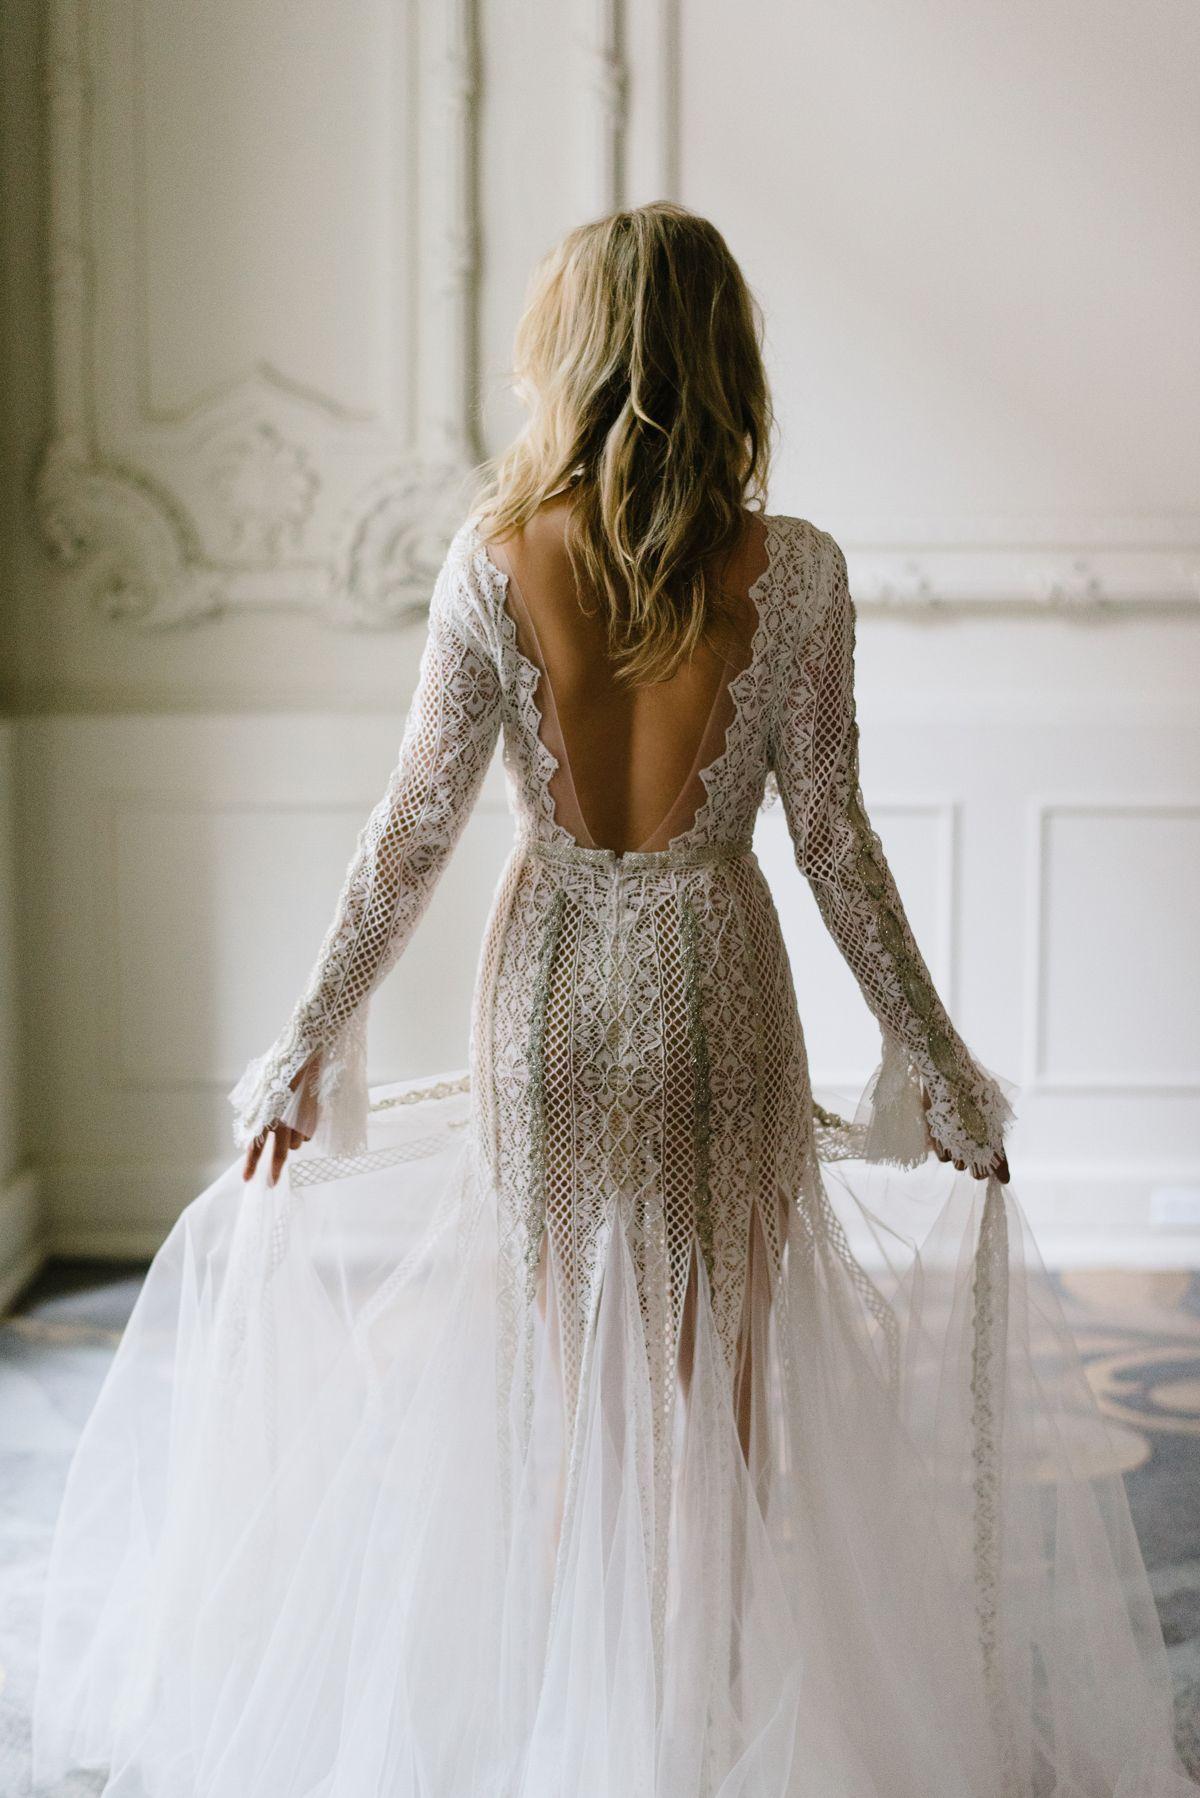 Sexy and Romantic Bridal Session   Hochzeitskleid